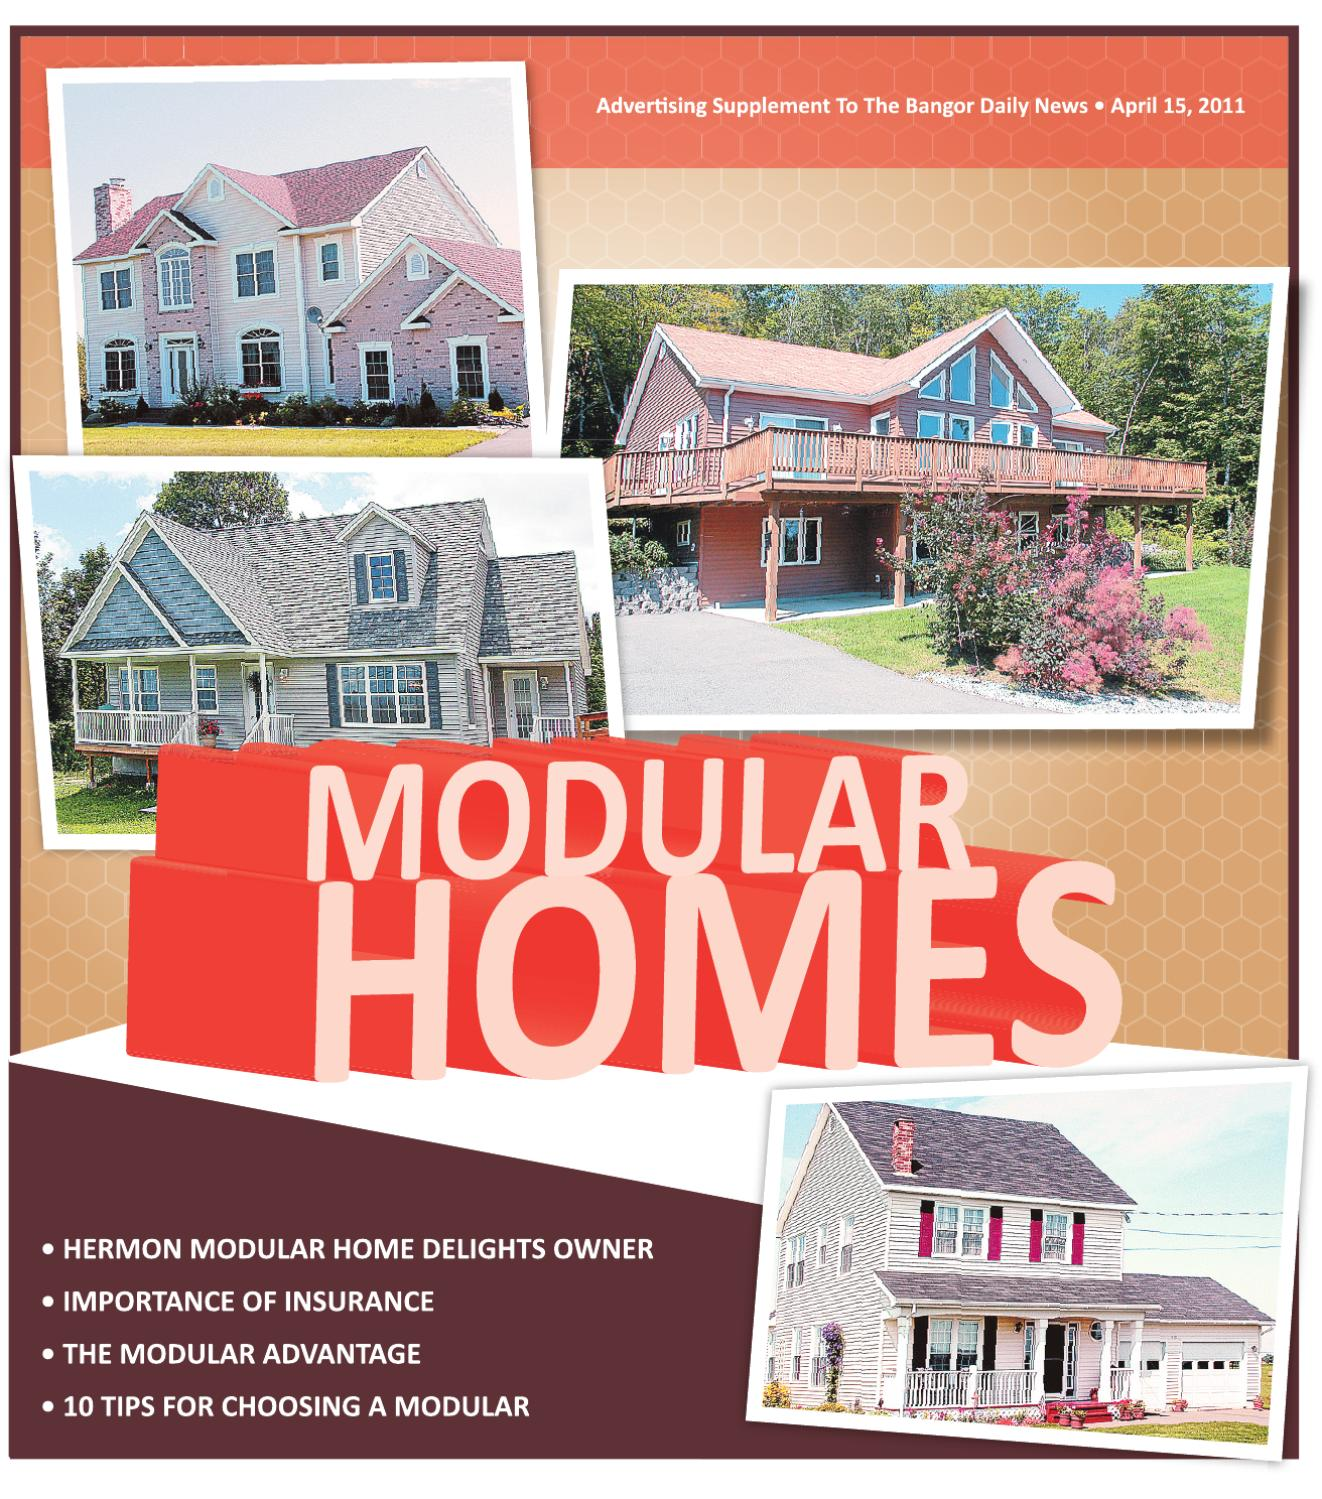 Modular Homes, Spring 2011 By Bangor Daily News